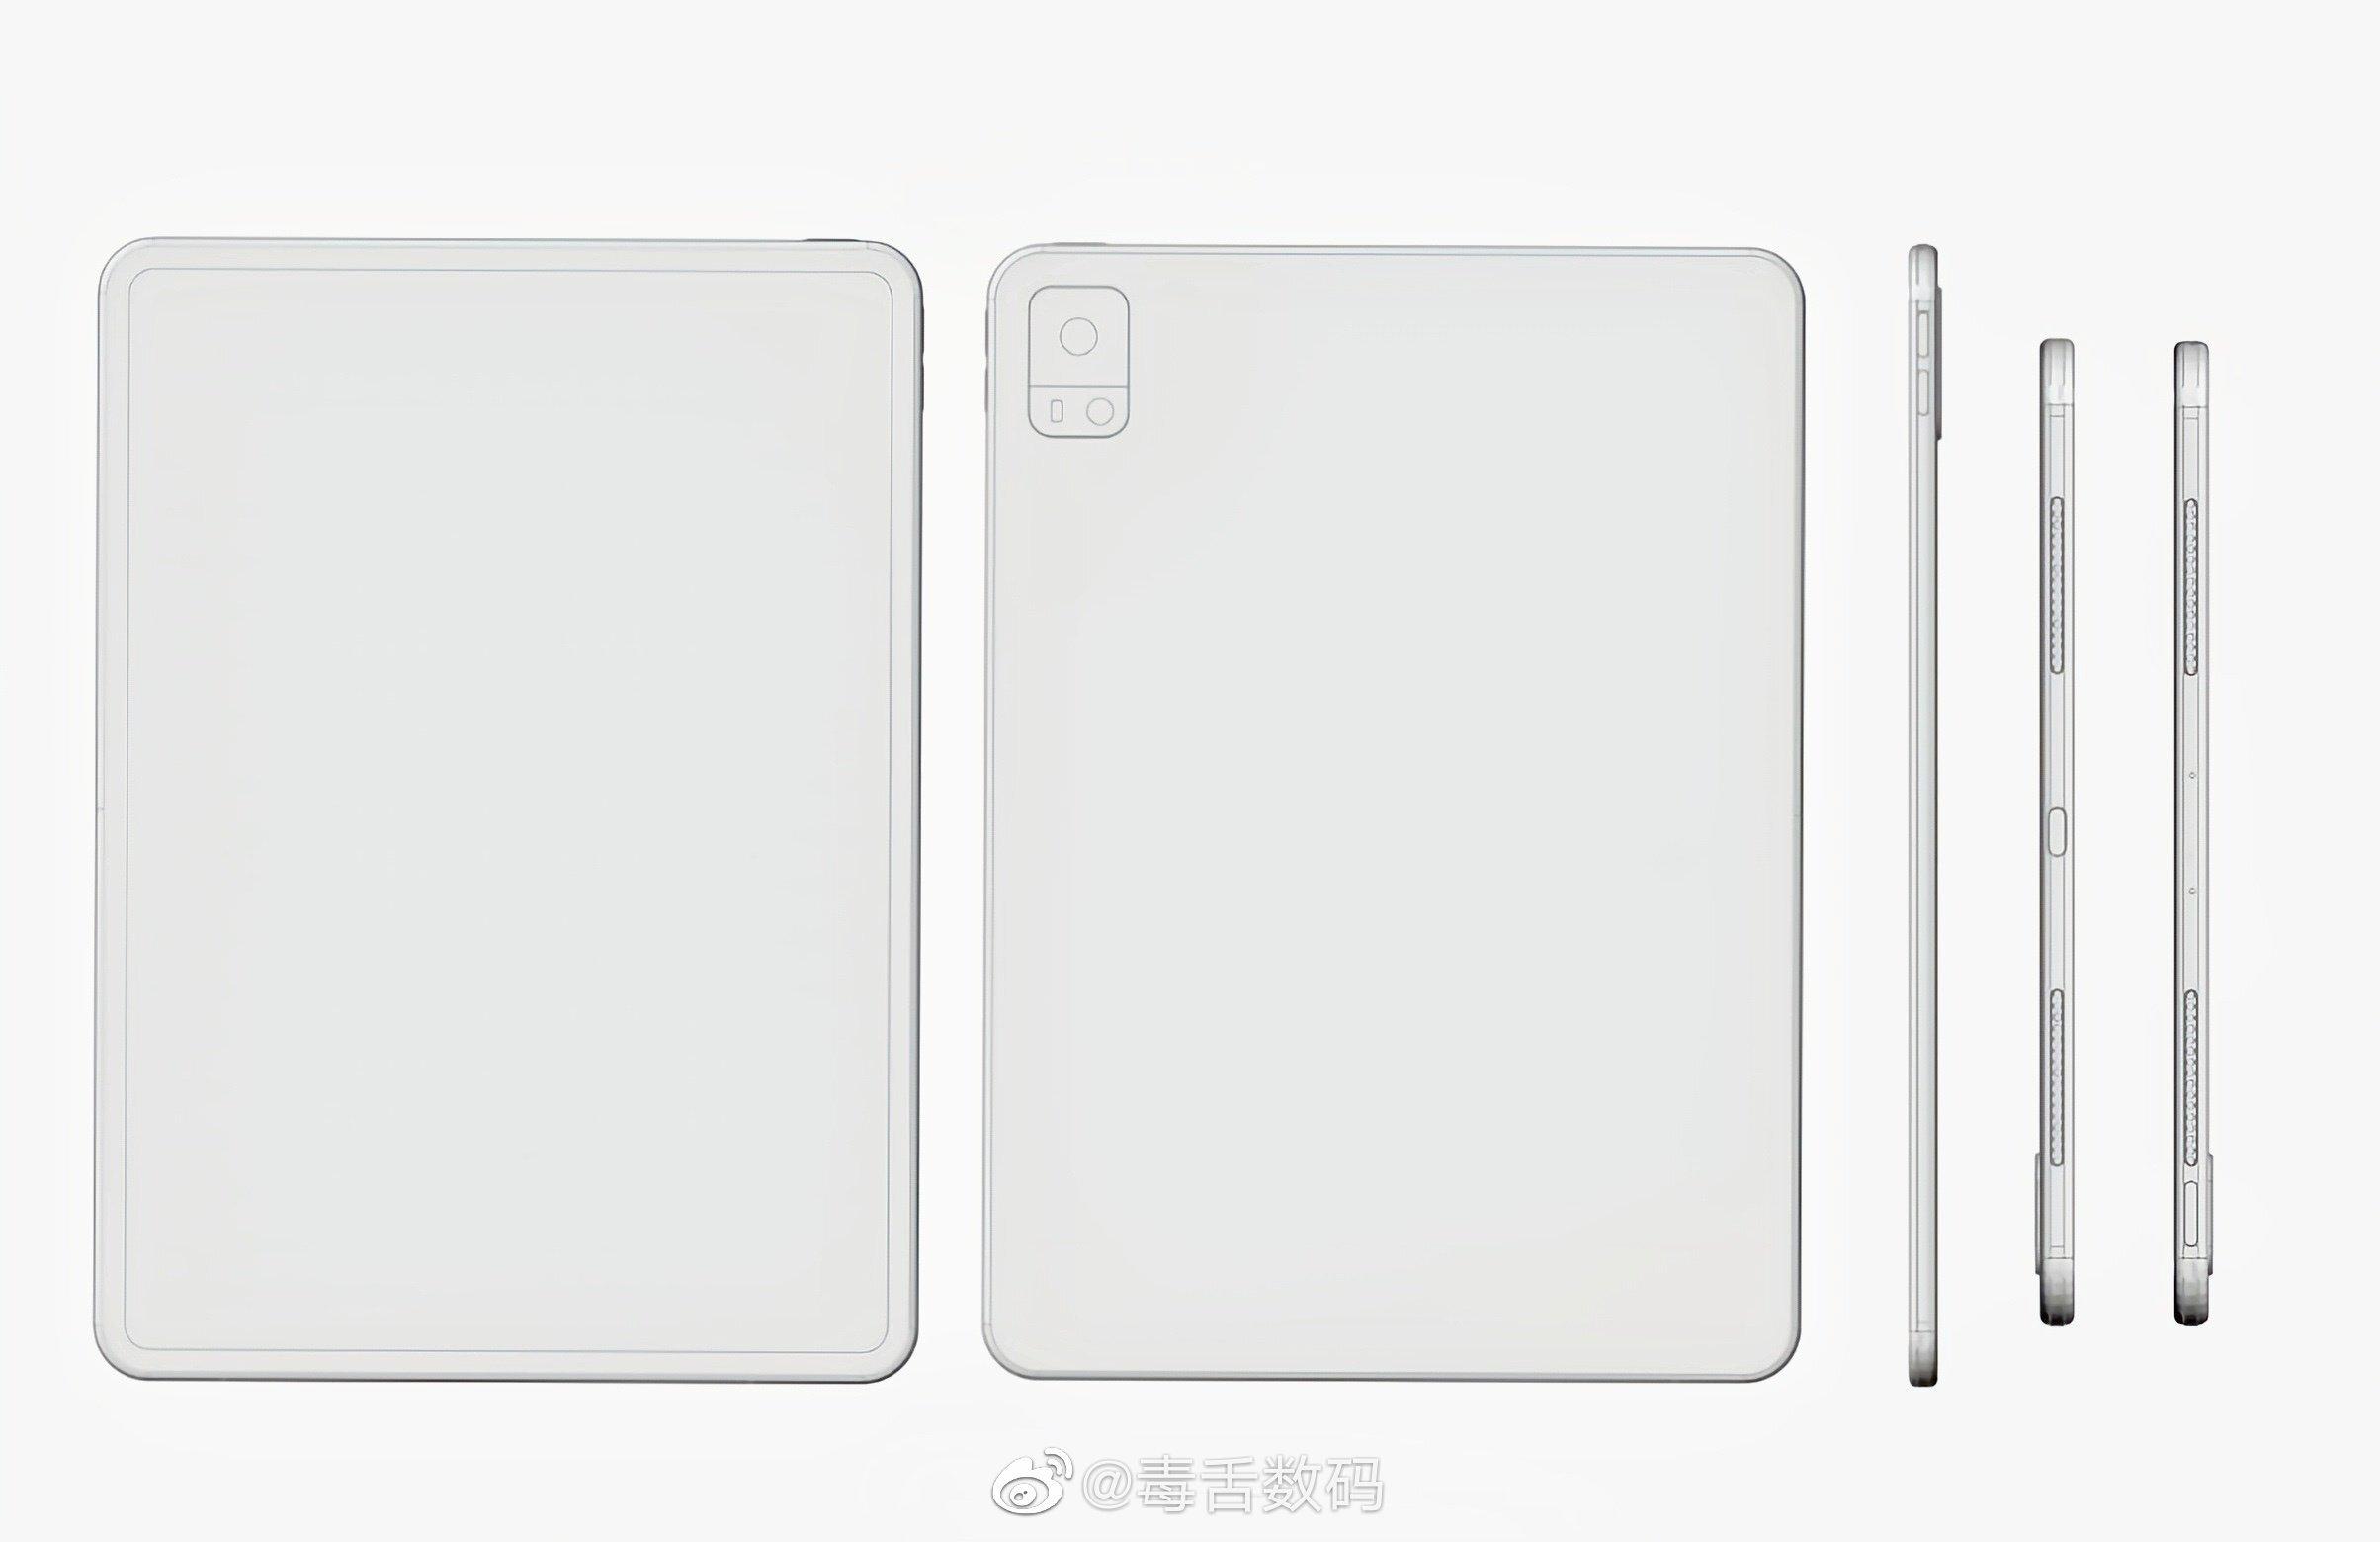 Vivo Tablet Design Leakjpeg 2408x1560x